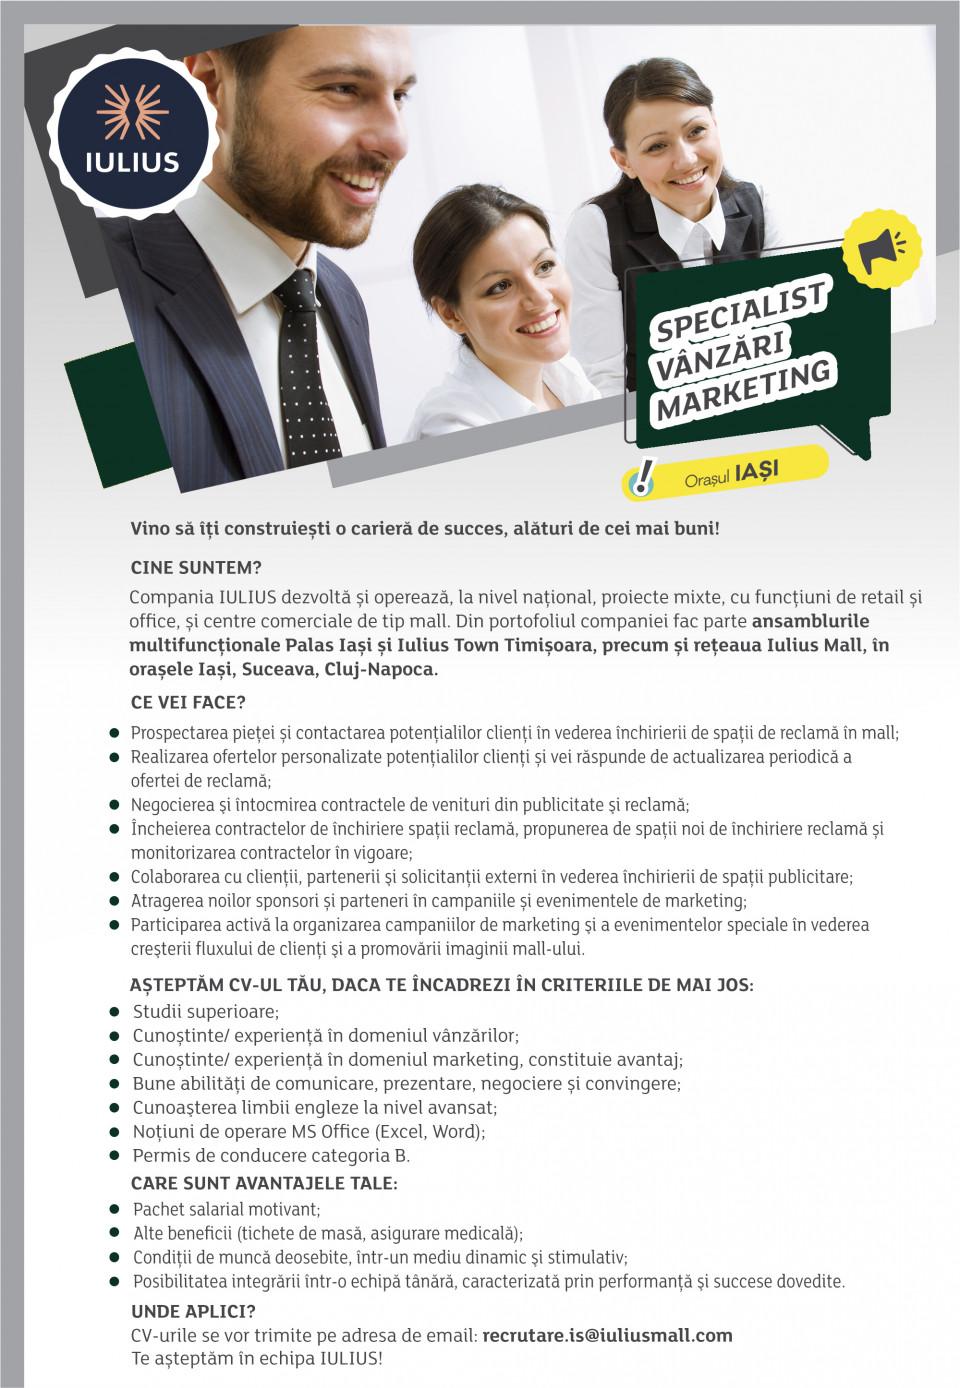 Specialist Vanzari Marketing - Iasi